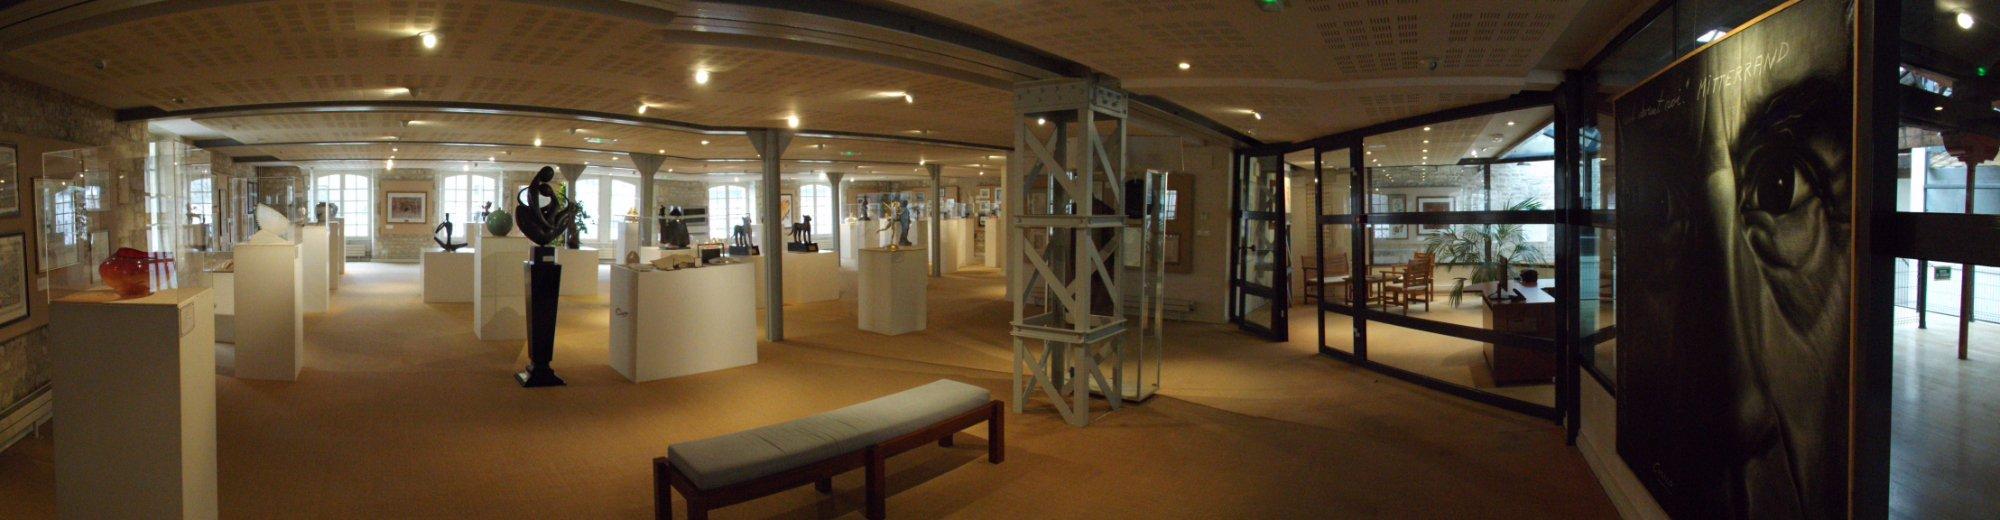 Musée François Mitterrand